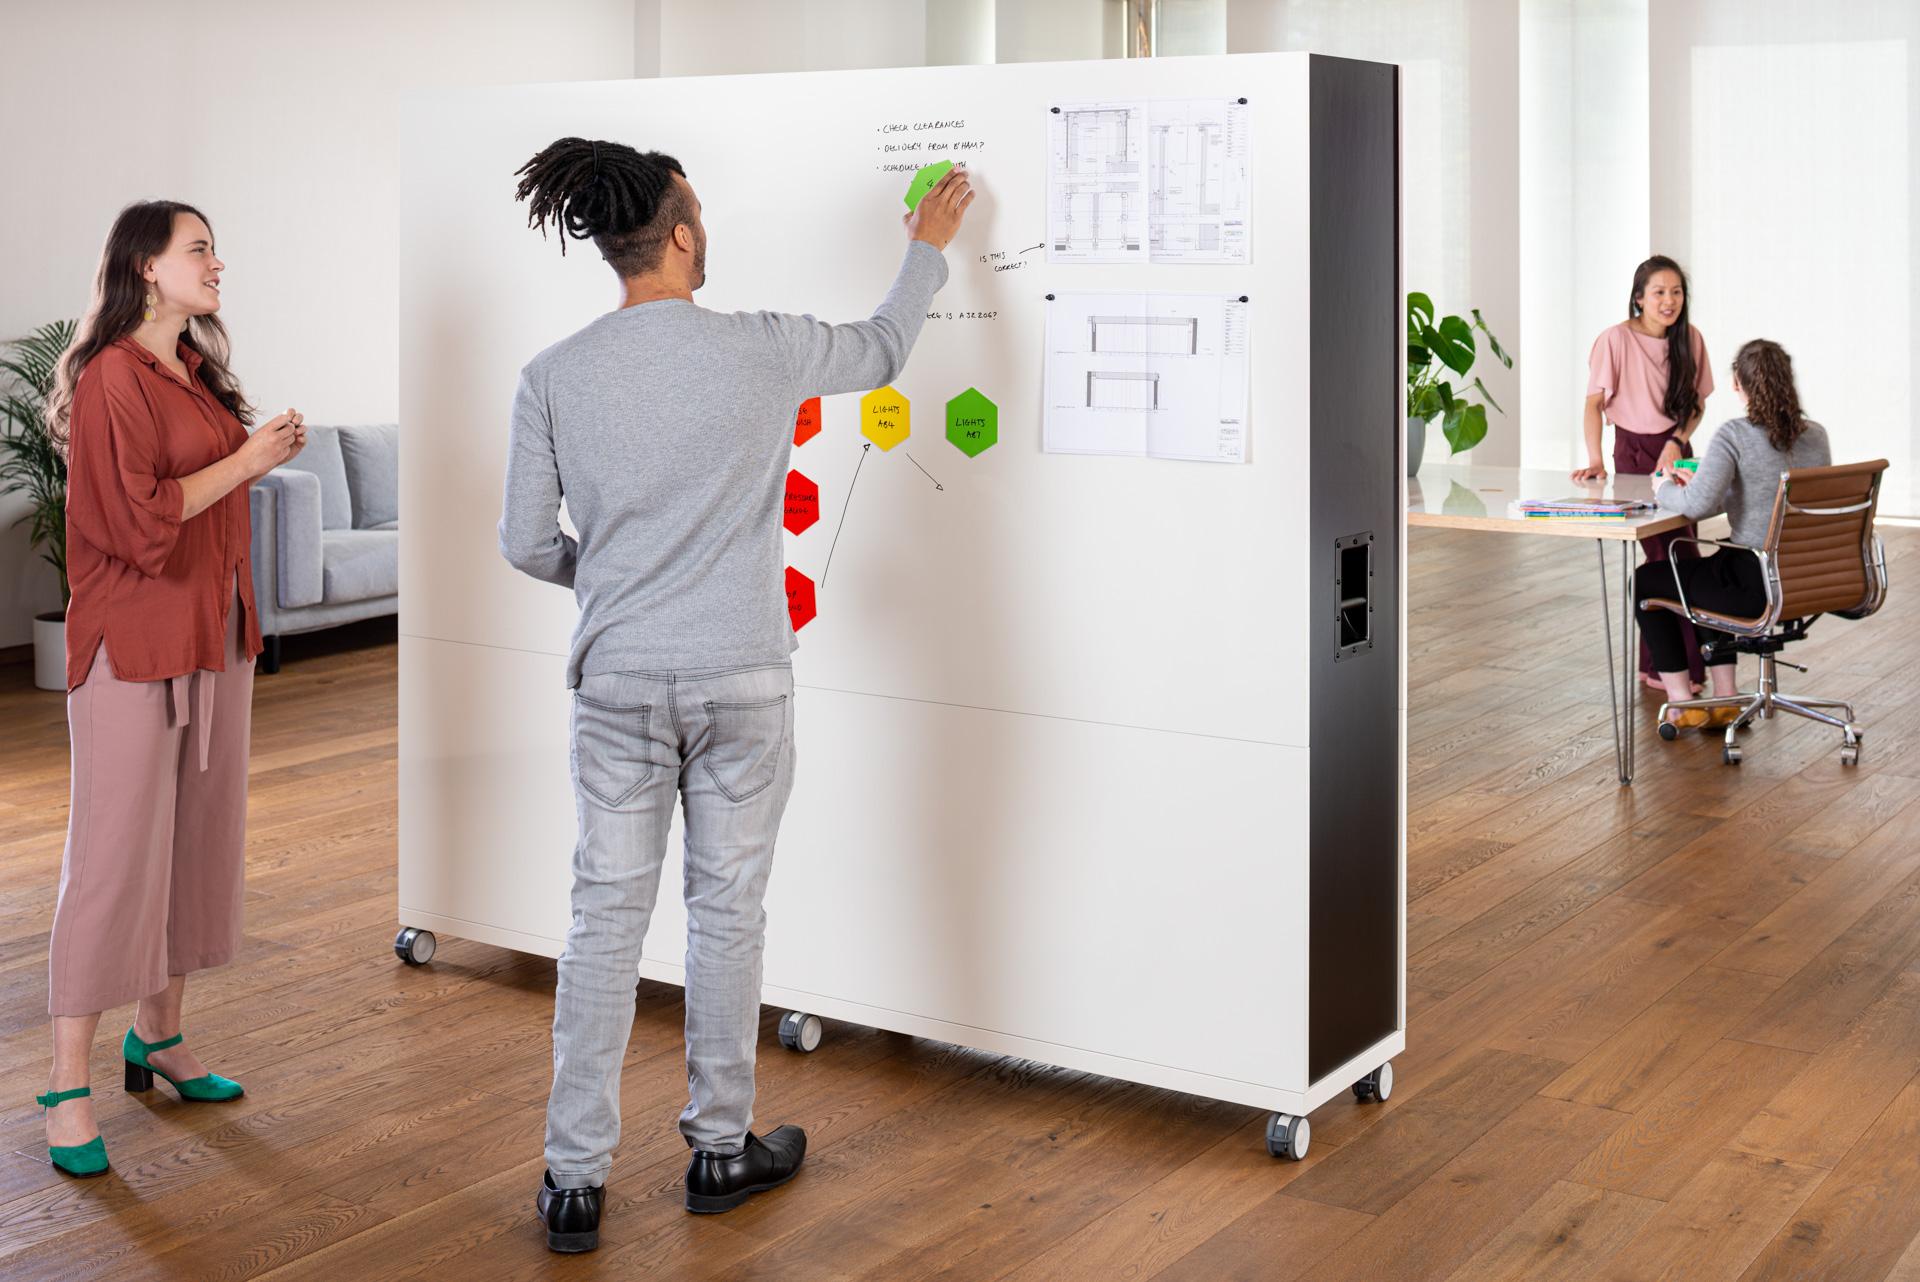 ThinkingWall Divider in use